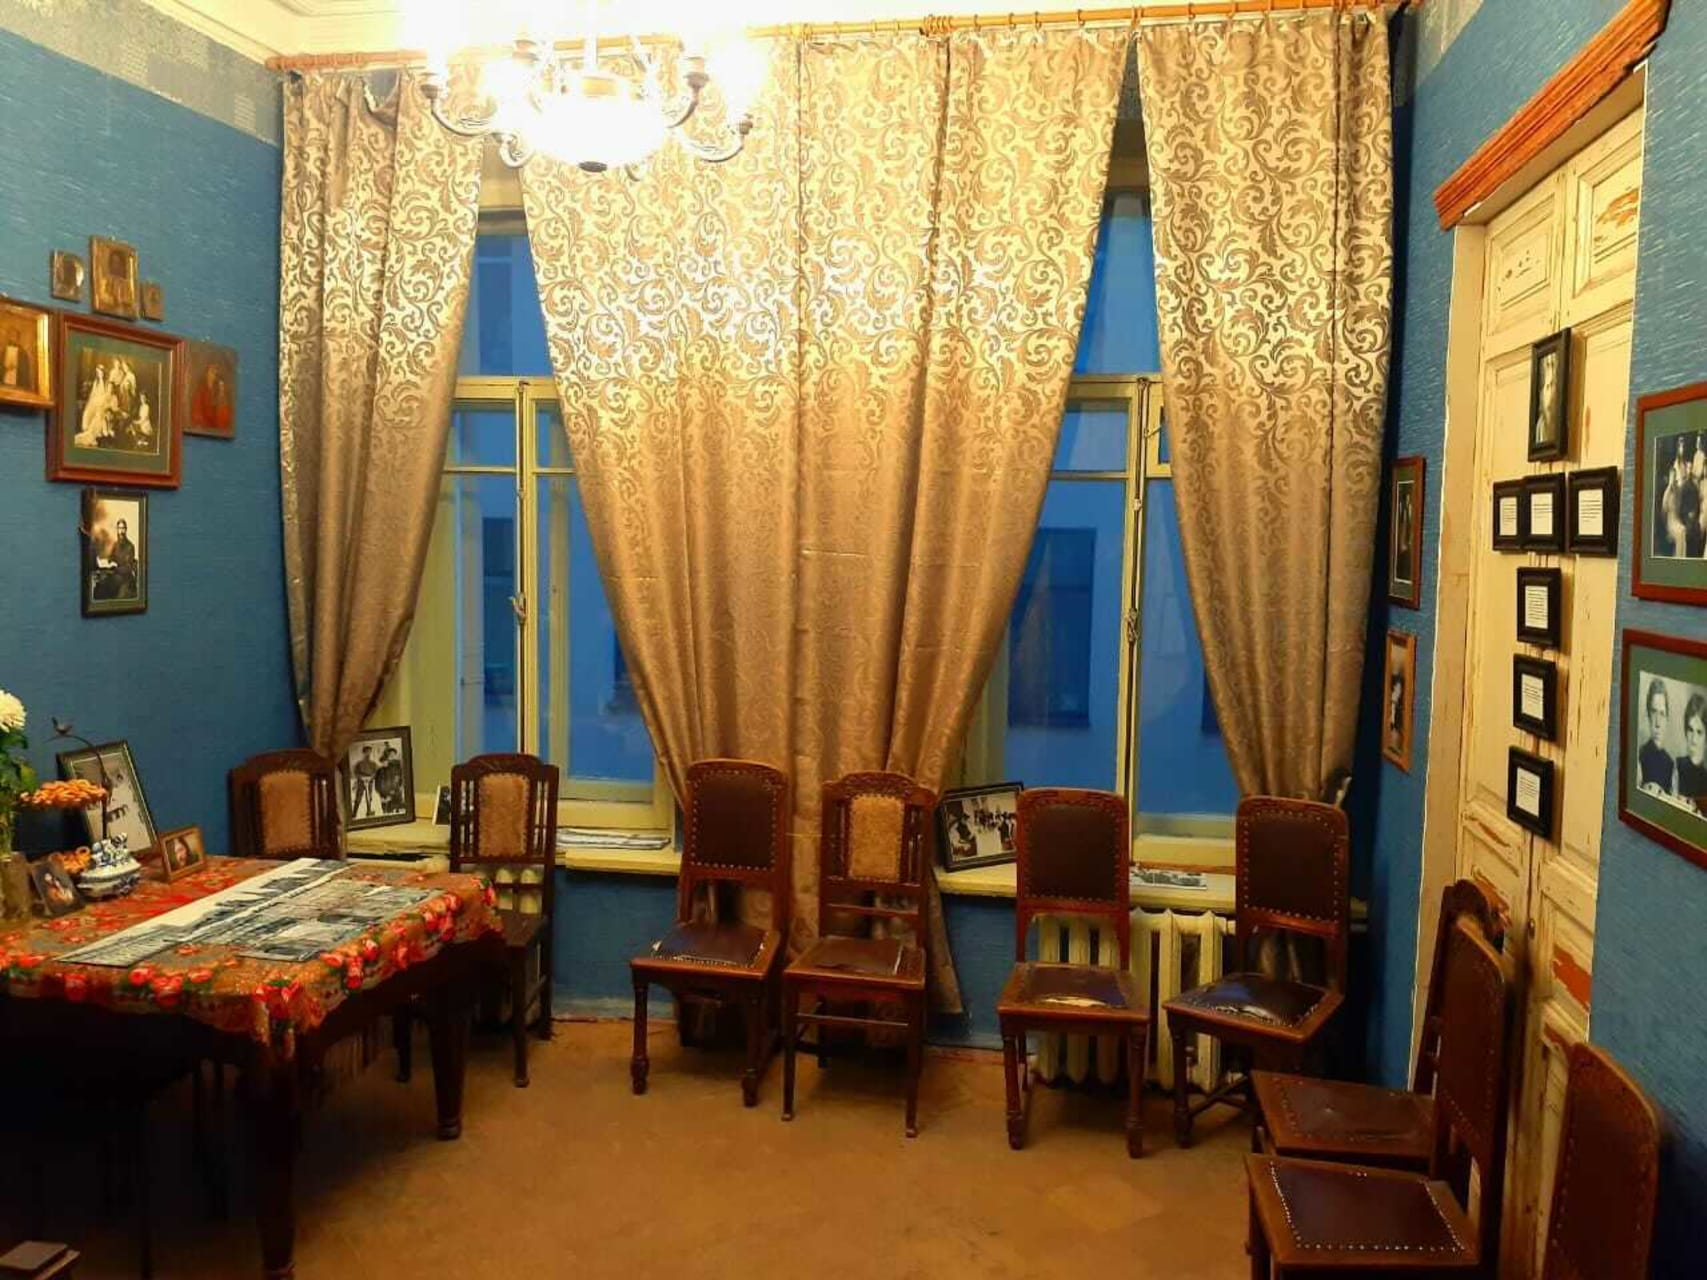 Saint Petersburg - Memorial Apartment of Grigori Rasputin